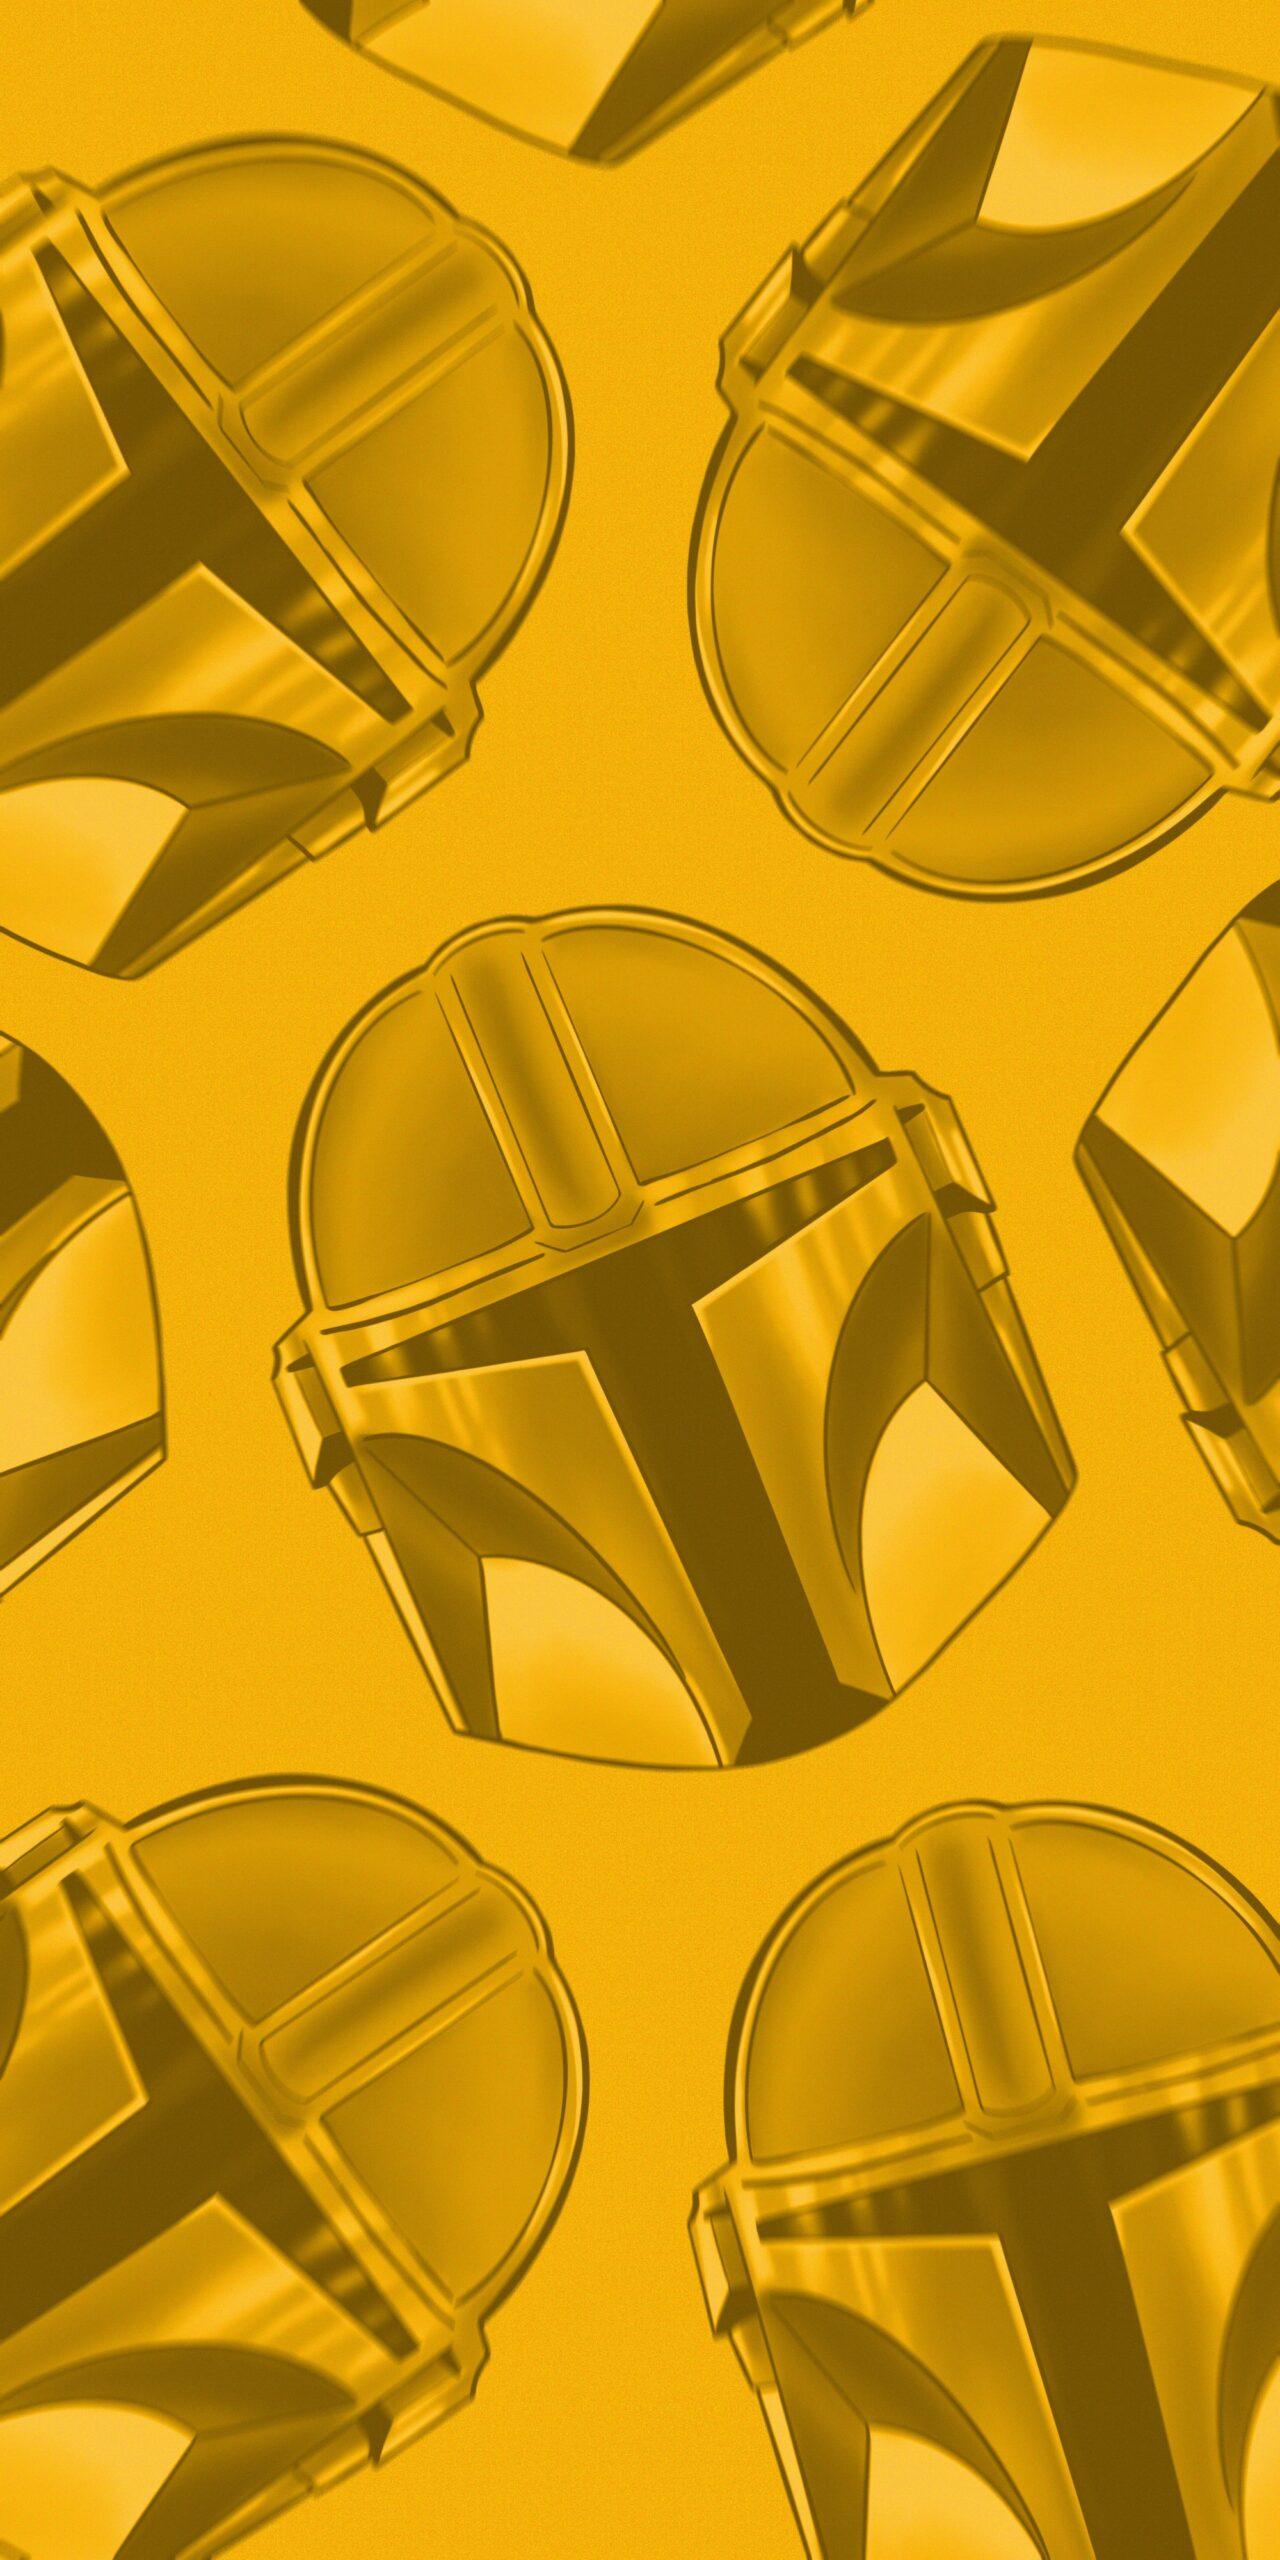 star wars mandalorian helmet yellow background wallpaper